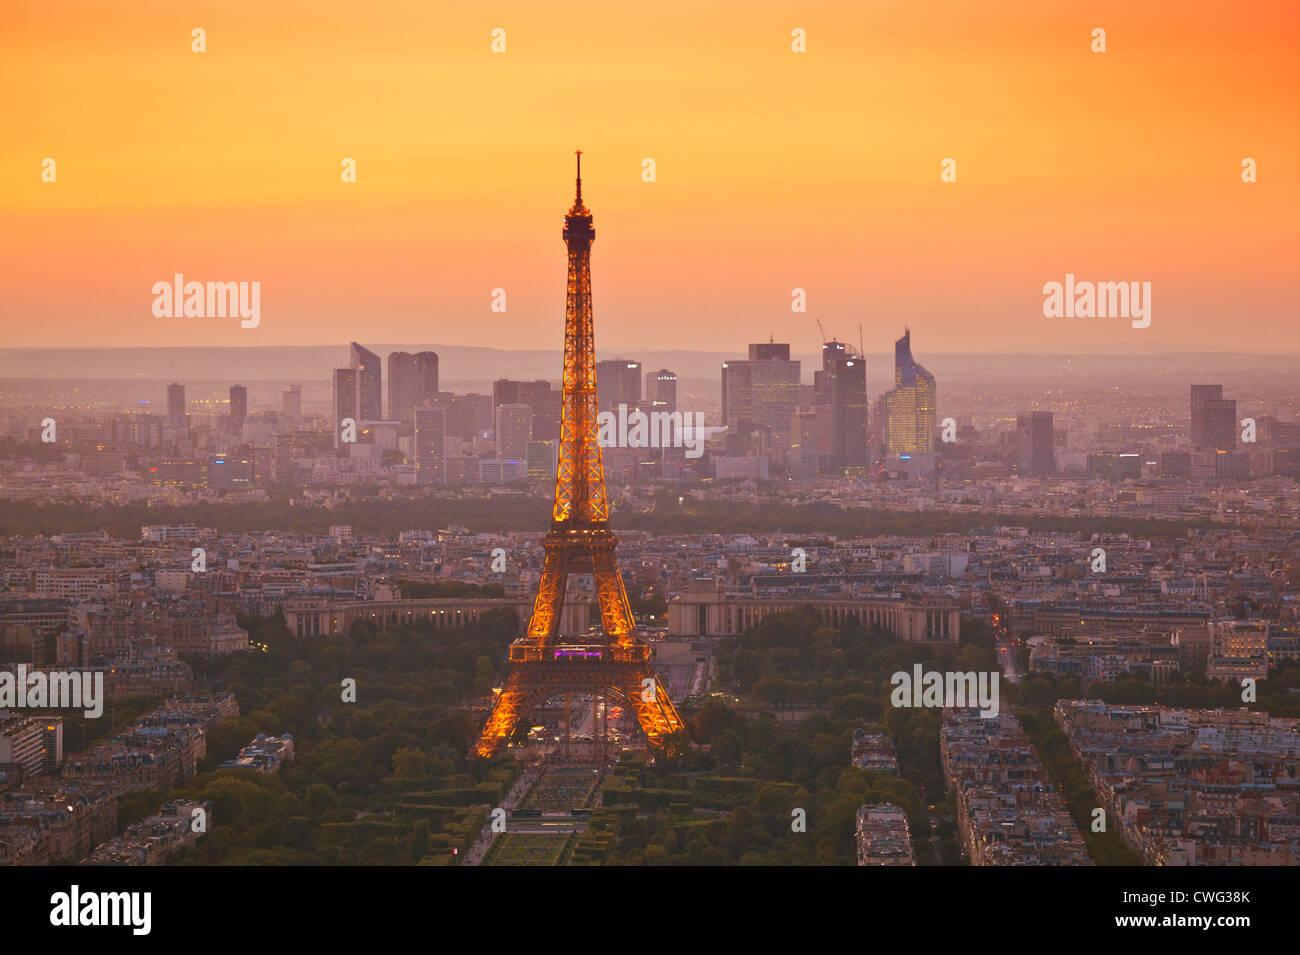 Paris-Skyline bei Sonnenuntergang zeigt den Eiffelturm und den umliegenden Gebieten Frankreich EU Europa Stockbild